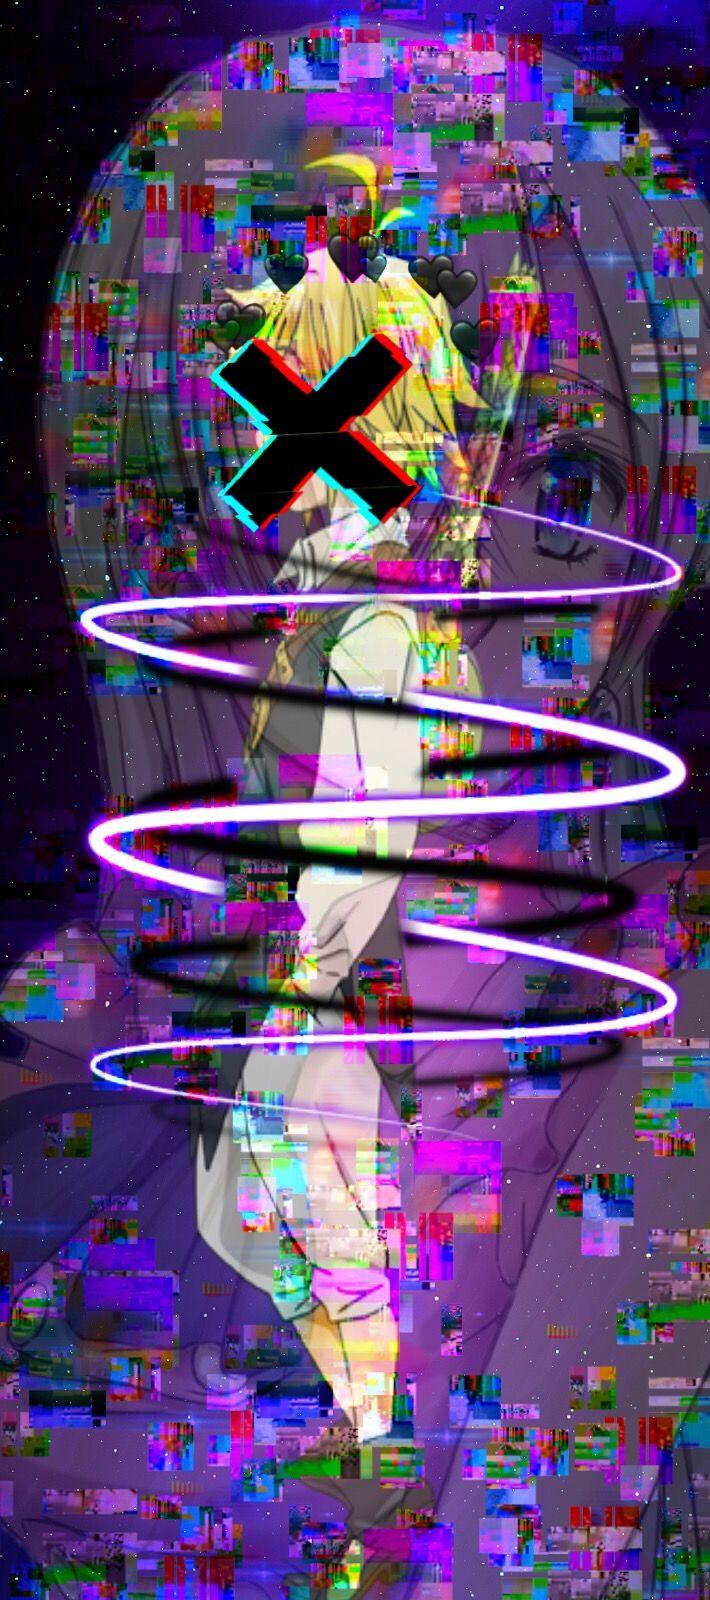 #freetoedit #meliodas #elizabeth #elizabethliones #anime #sevendeadlysins